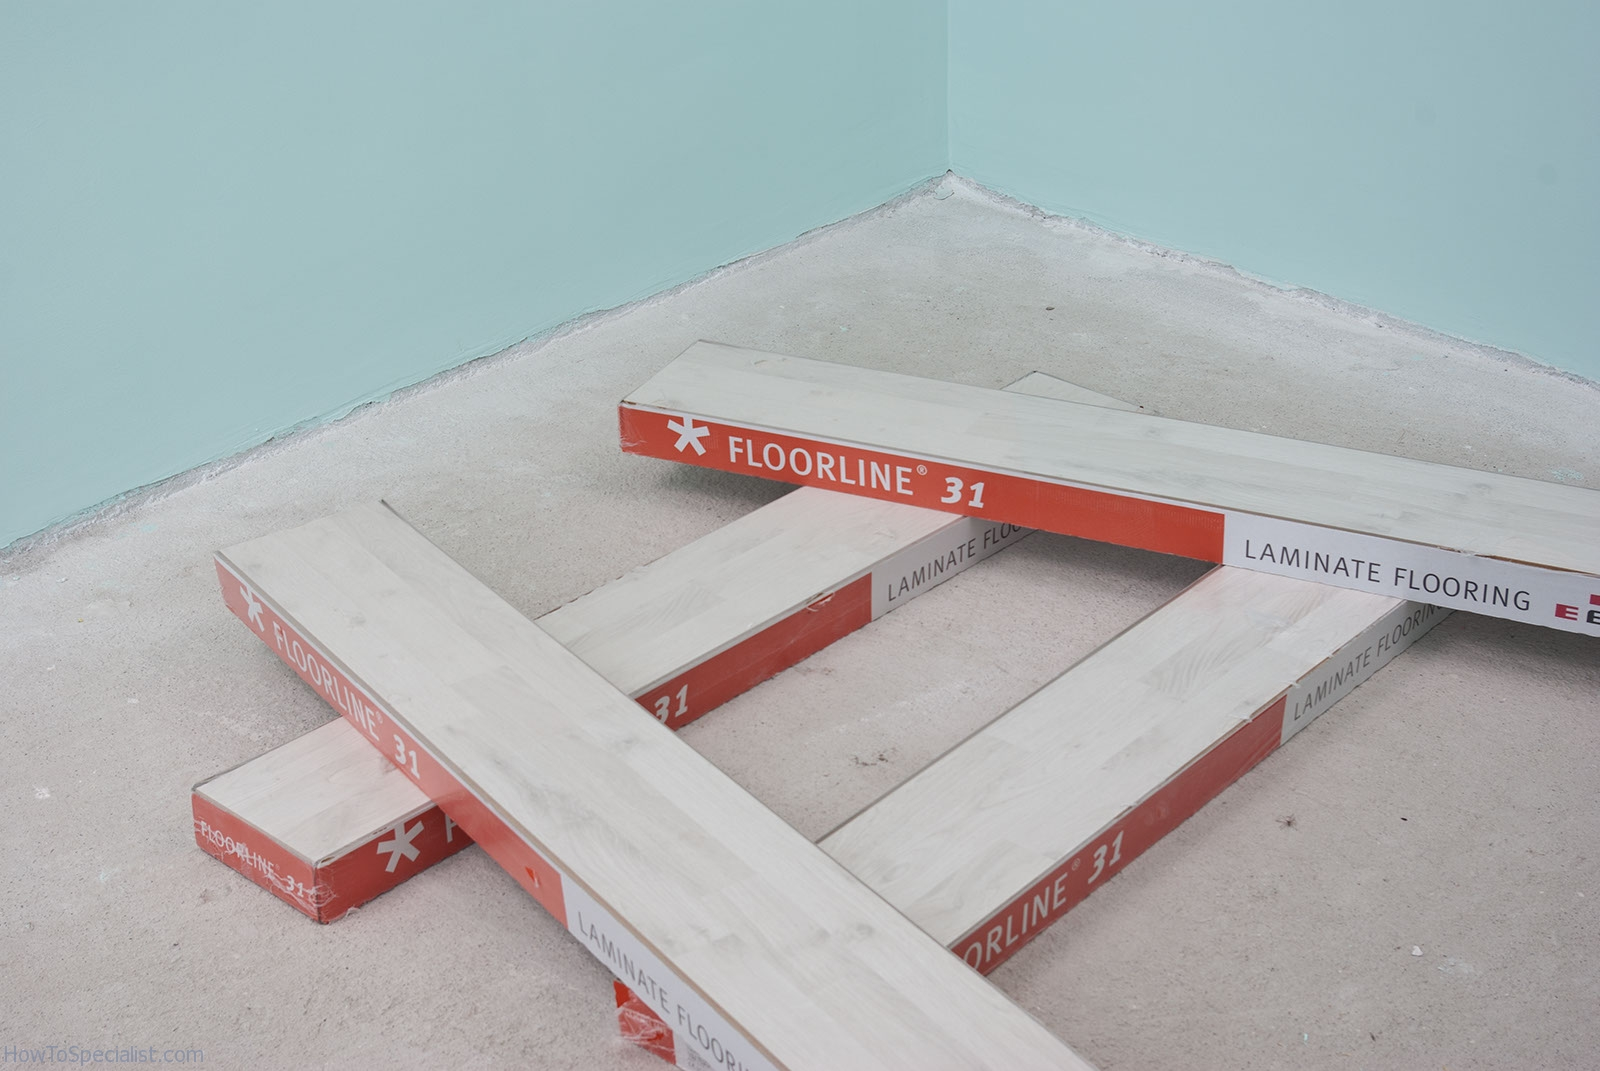 How to prepare the floor before installing laminate flooring